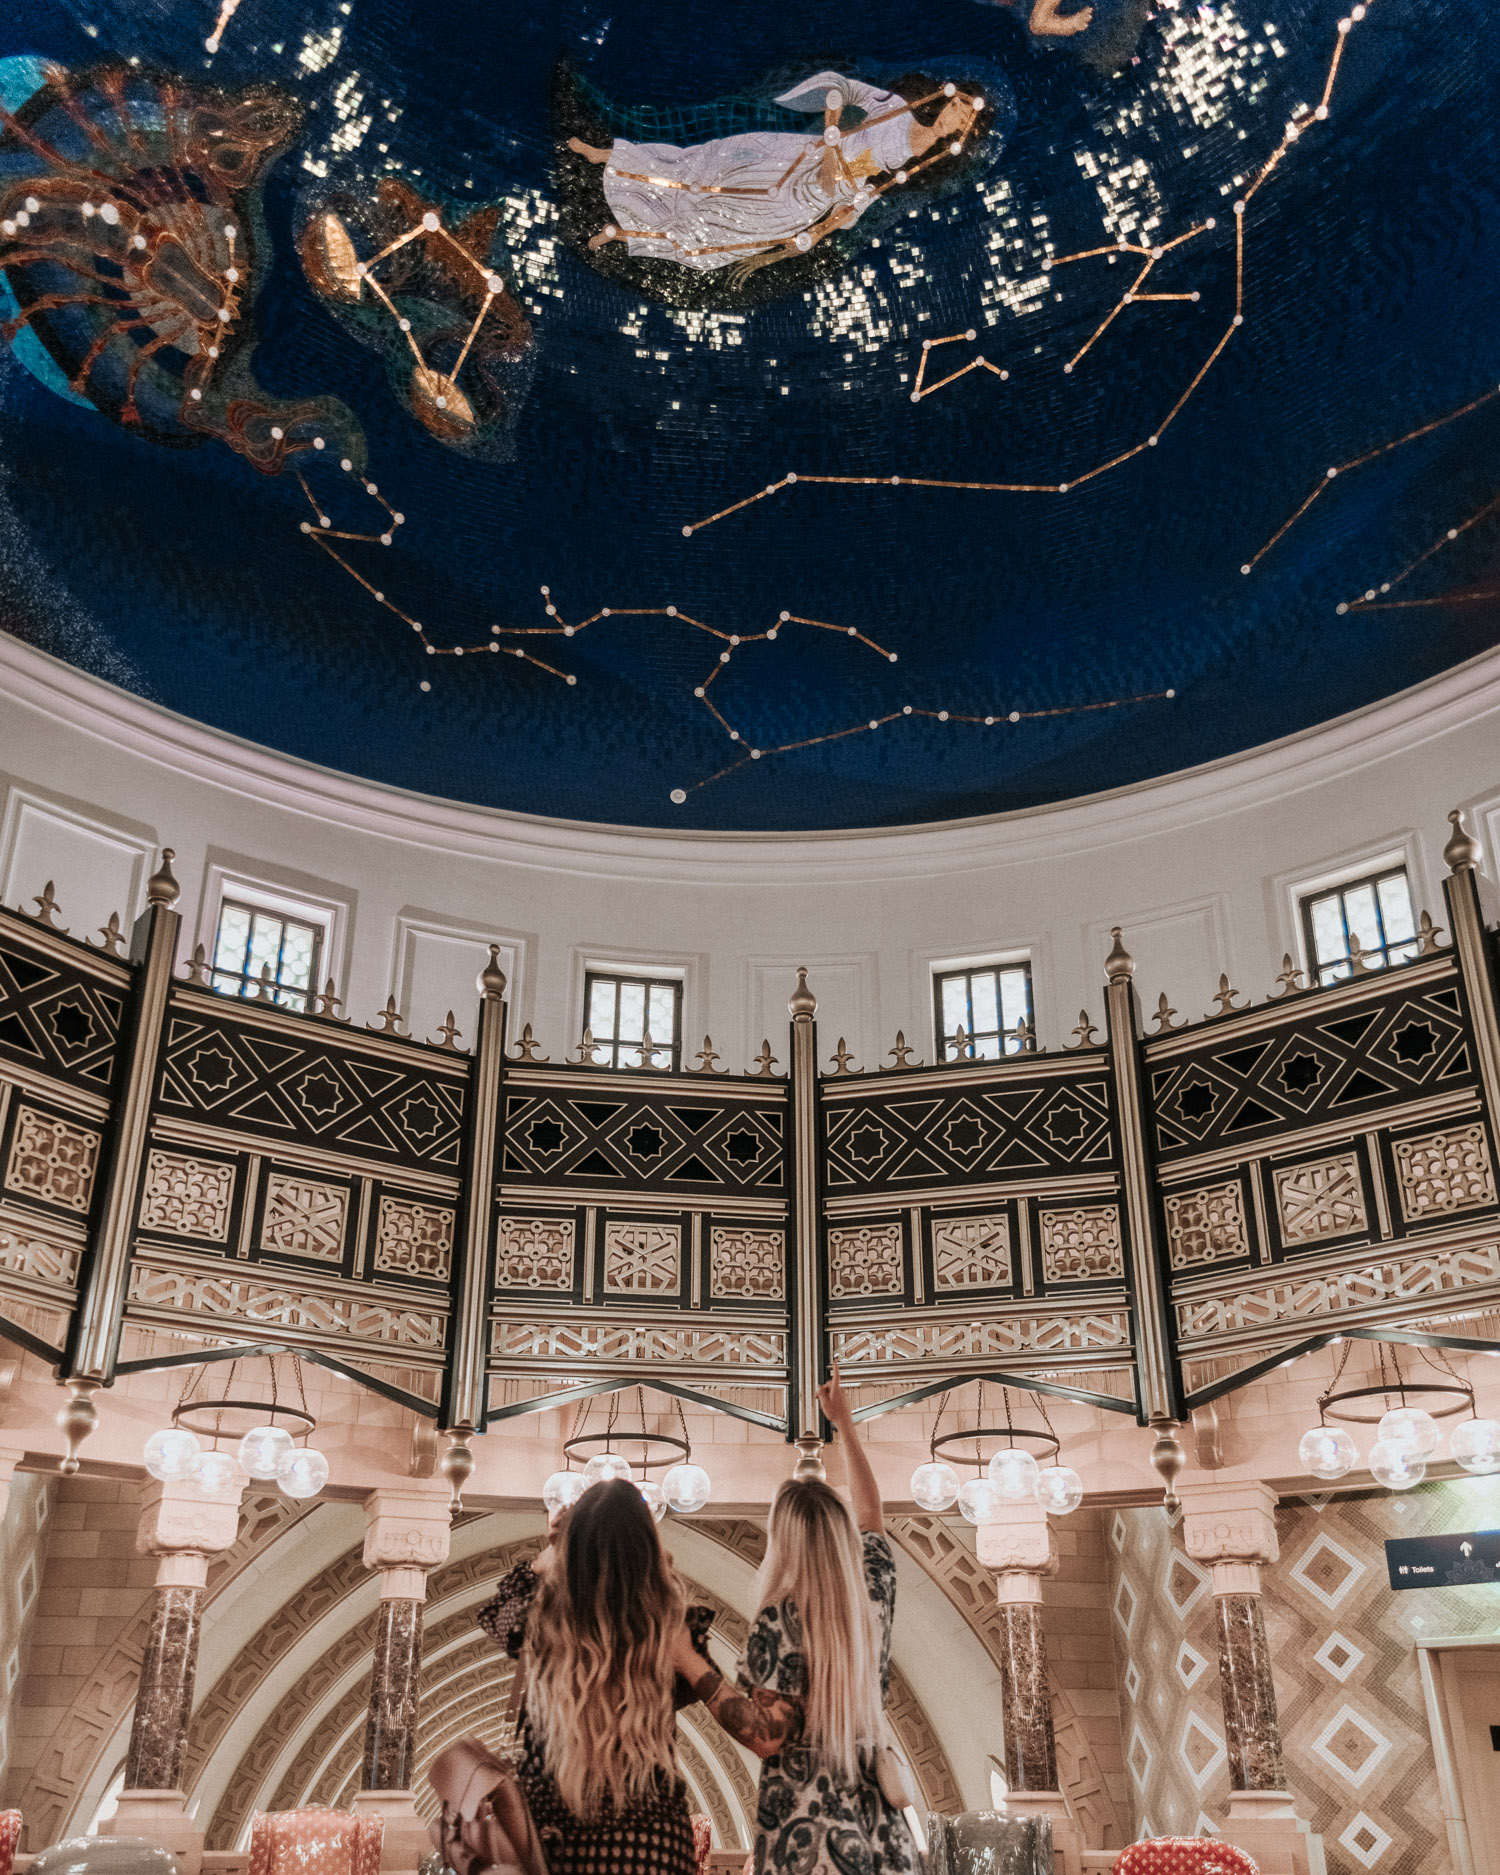 Zoodiac Rooftop, Sharjah Museum of Islamic Civilization